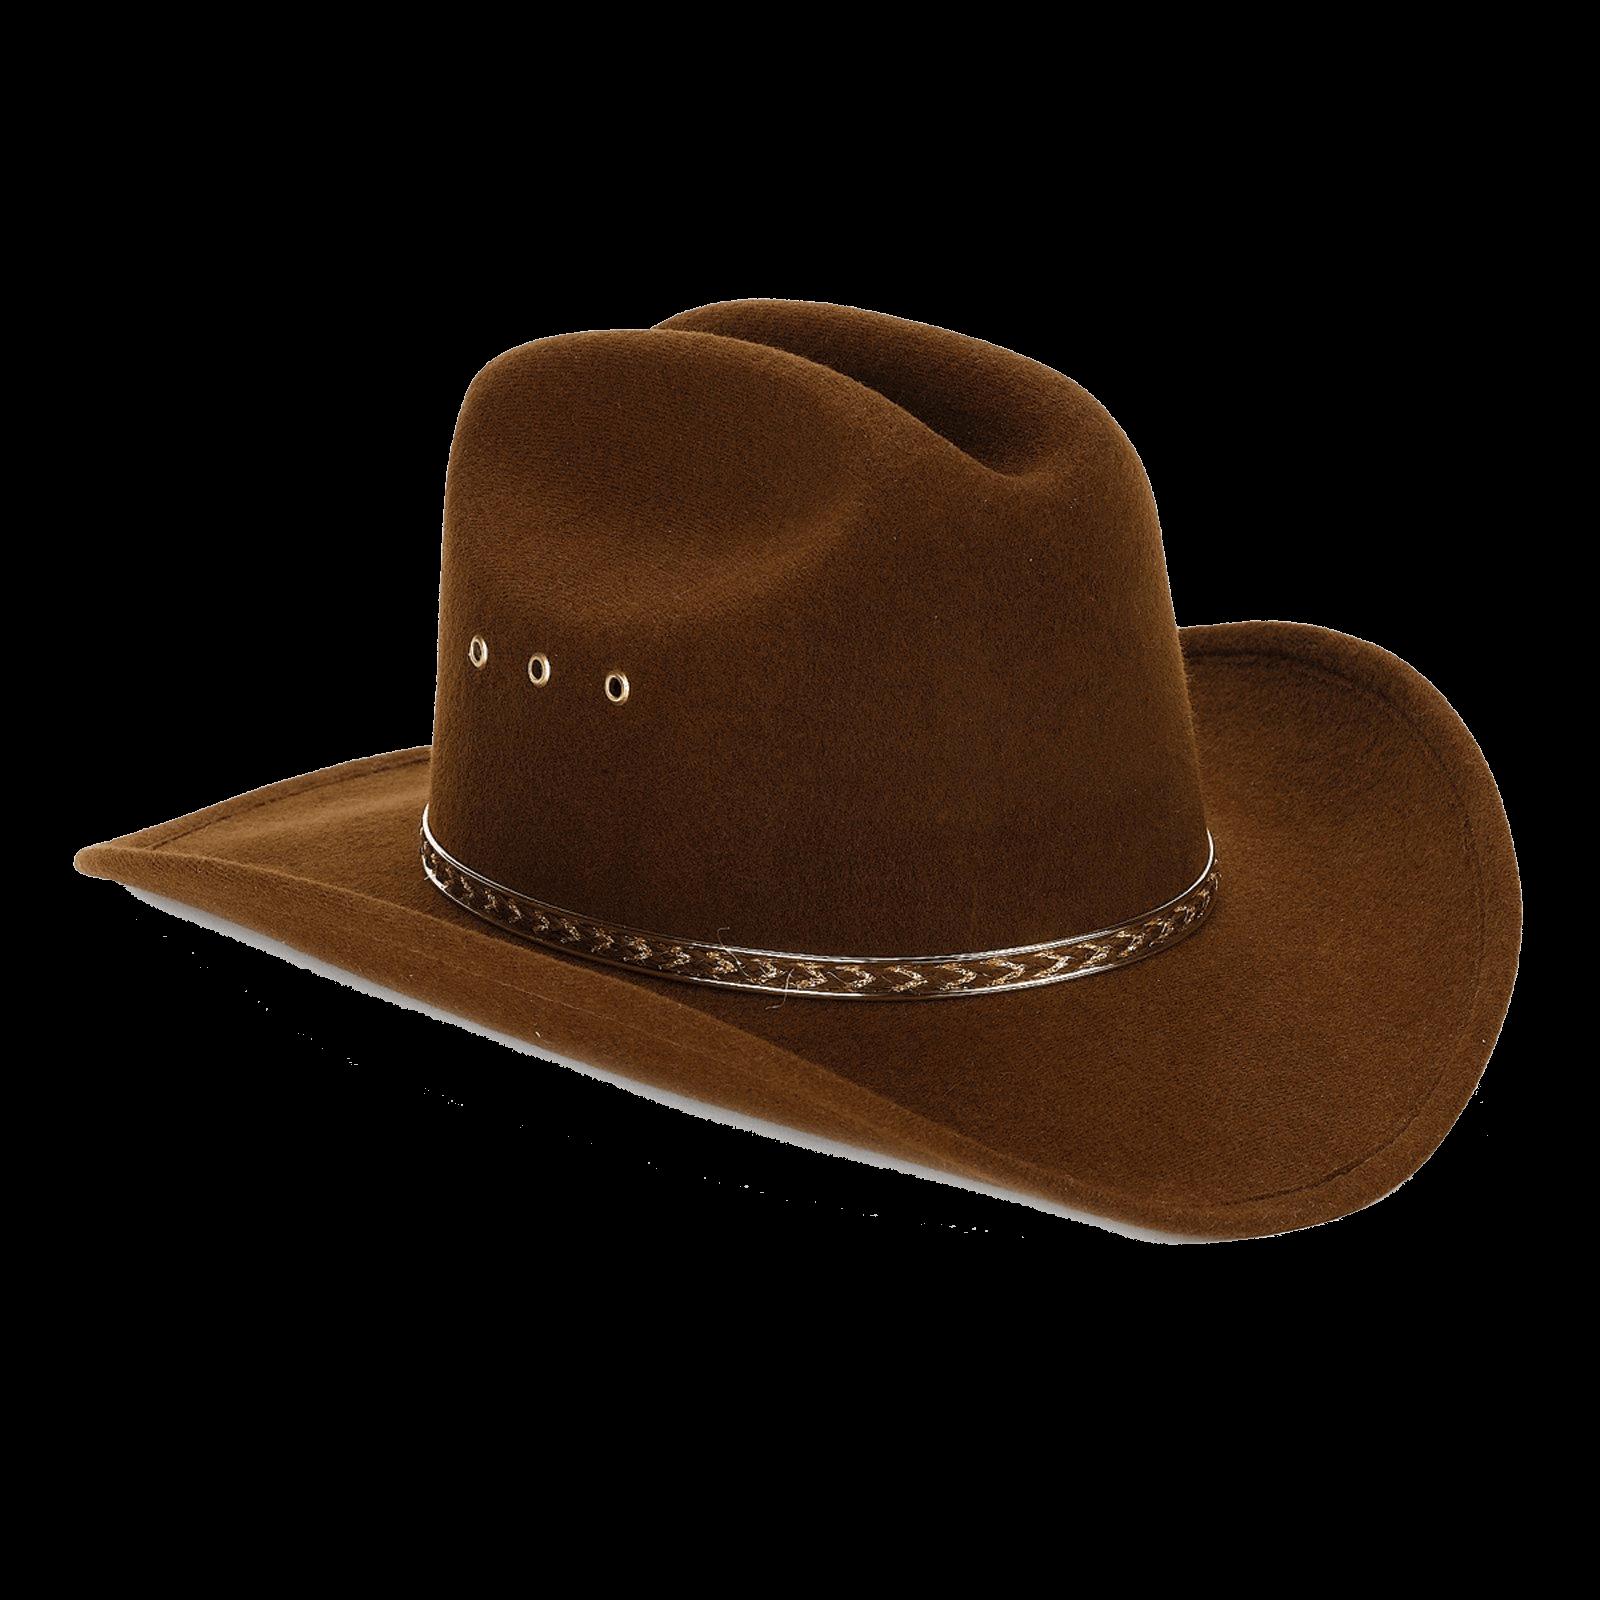 Cowboy Hat Brown Felt transparent PNG.